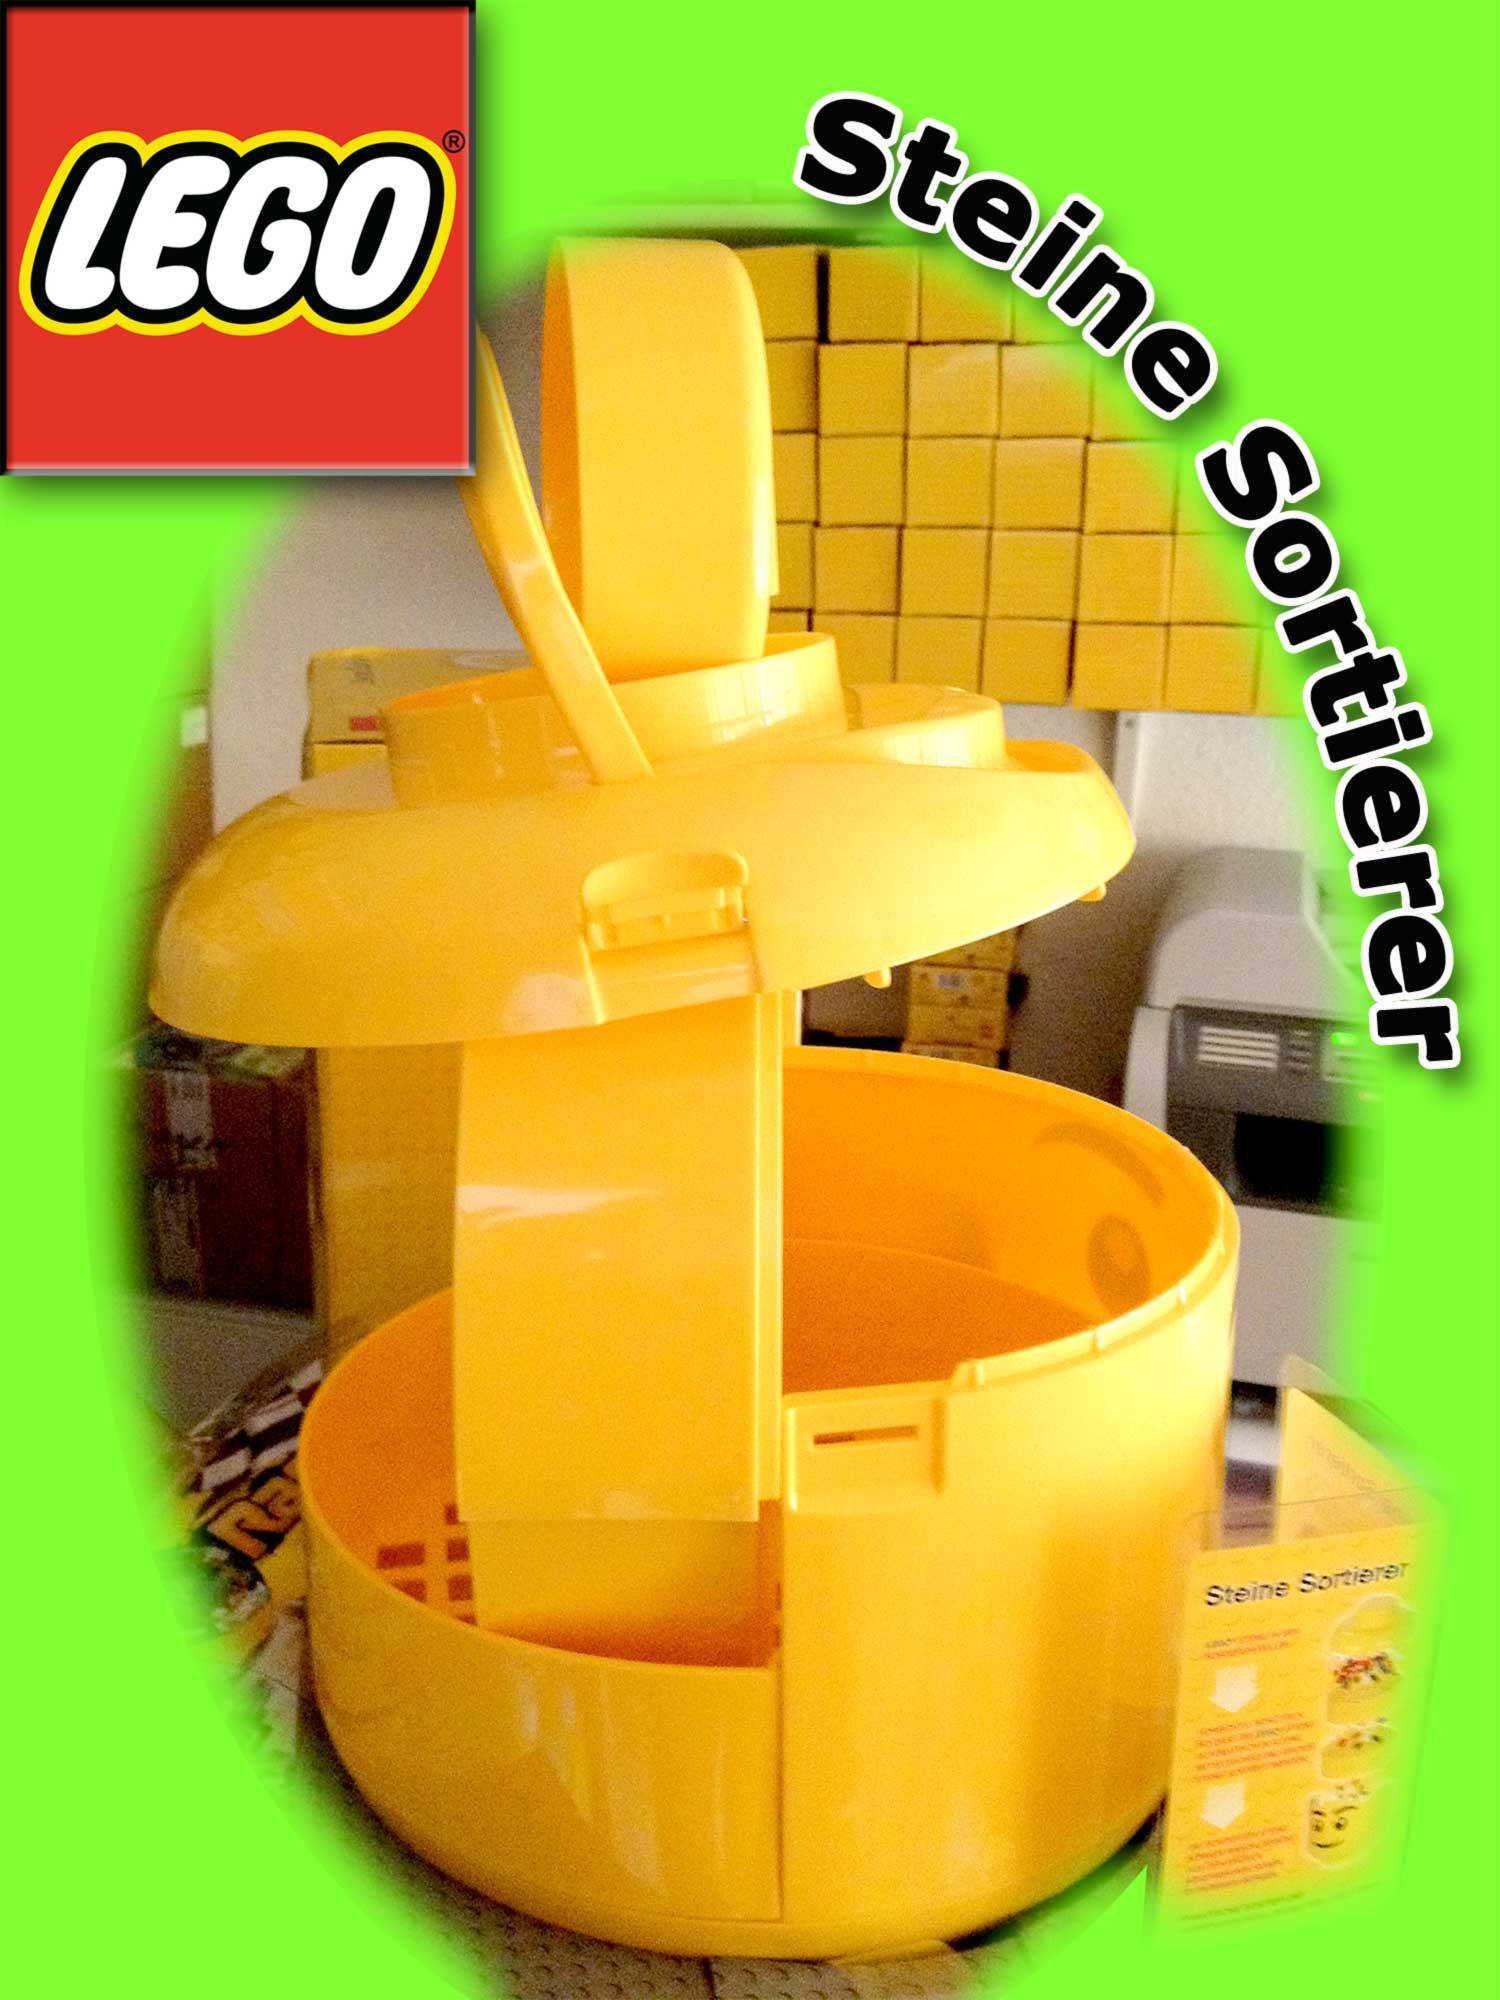 lego steine sortierer eimer sort store xxl kopf. Black Bedroom Furniture Sets. Home Design Ideas